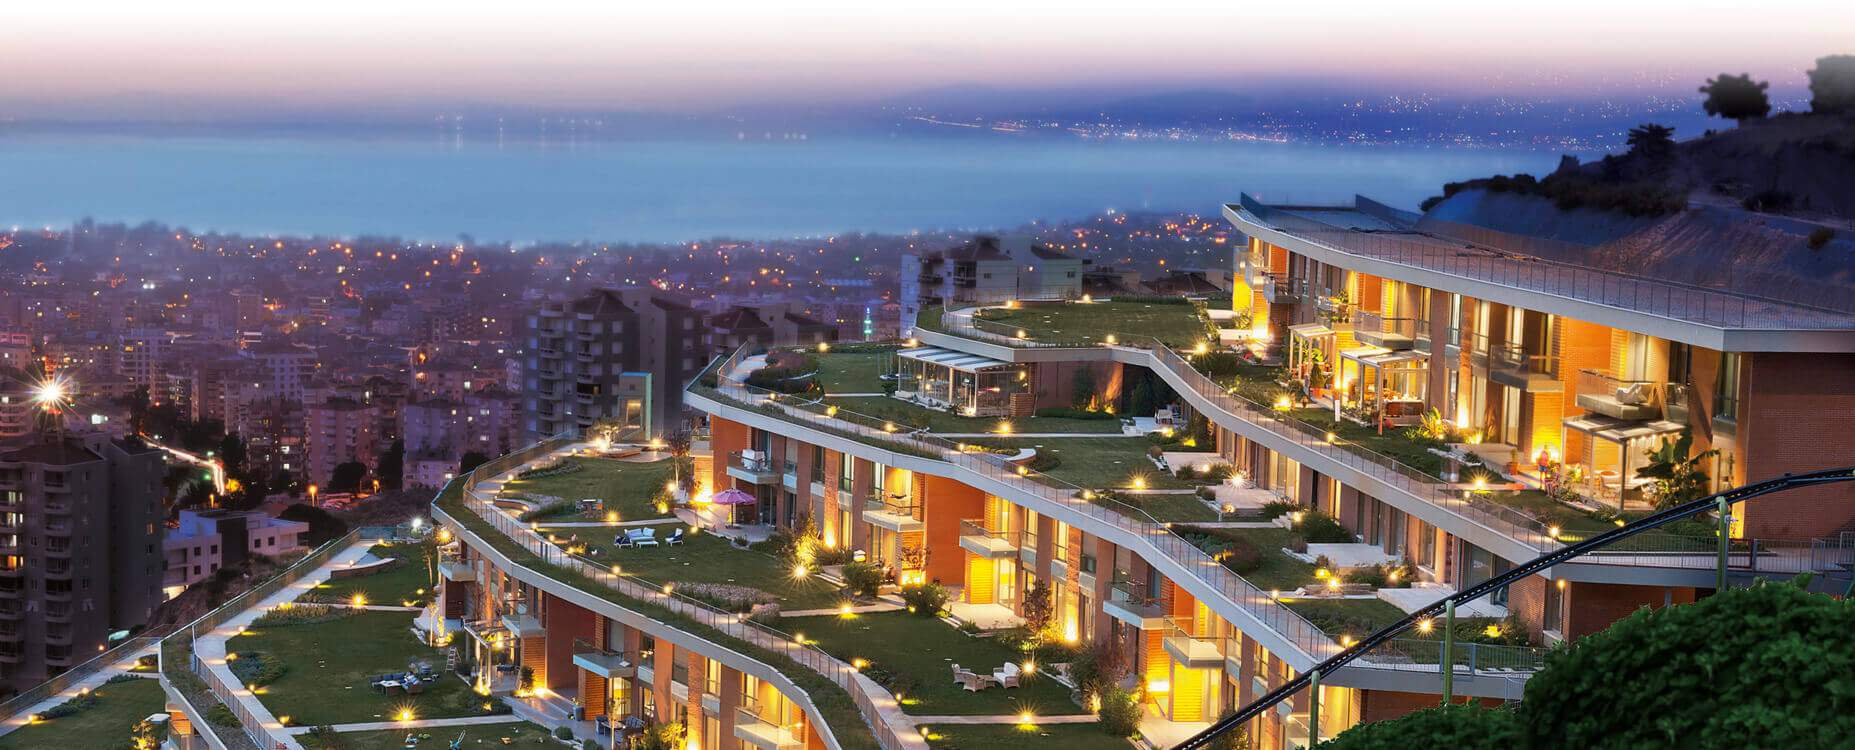 Asma Bahçeler - İzmir Narlıdere